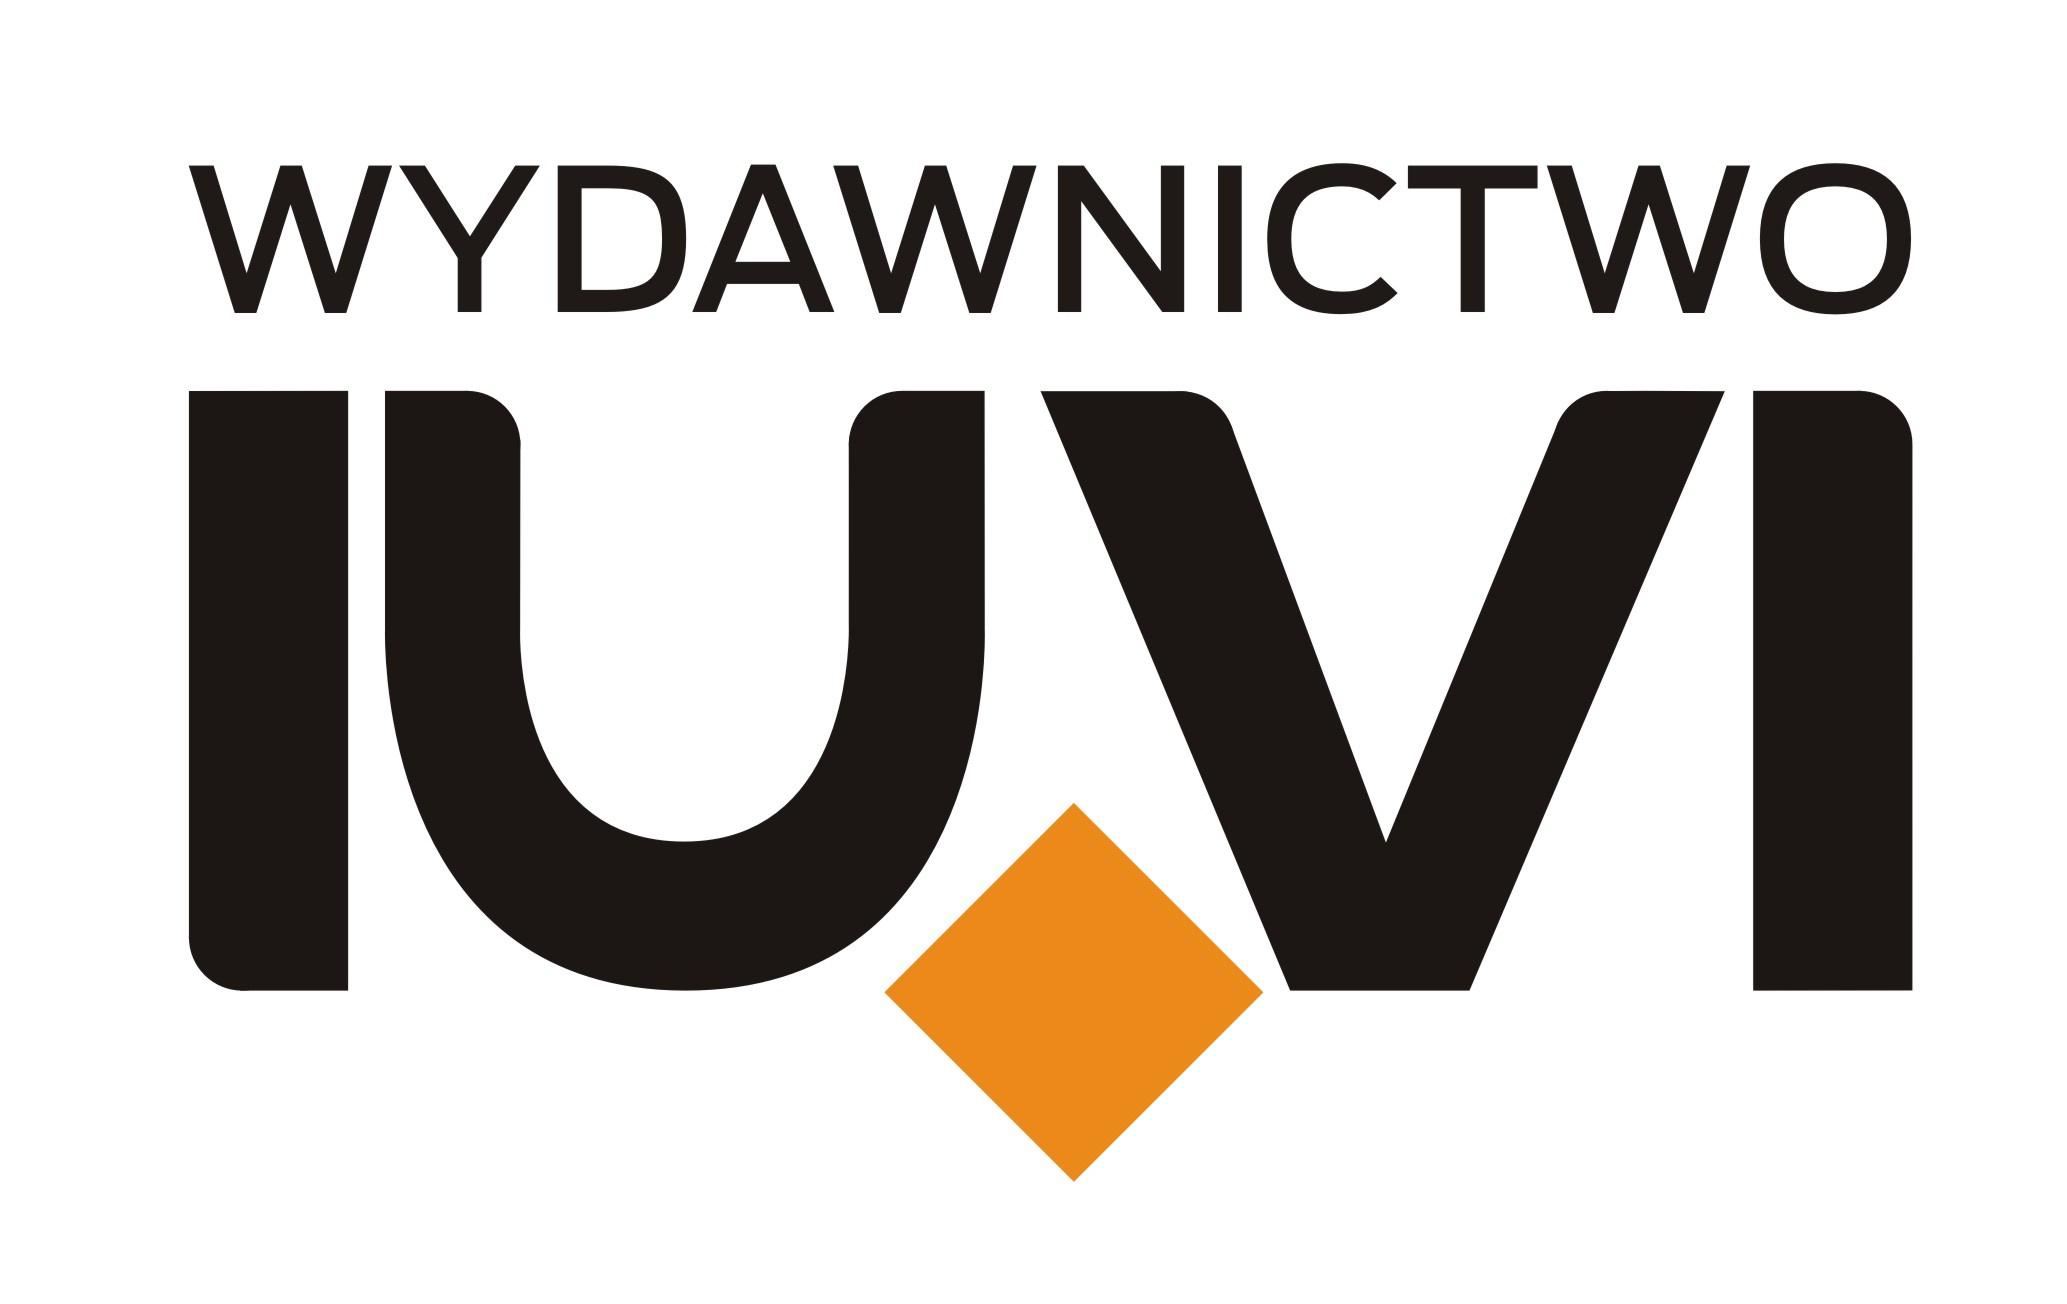 http://kopd.pl/wp-content/uploads/2015/05/iuvi-logo.jpg